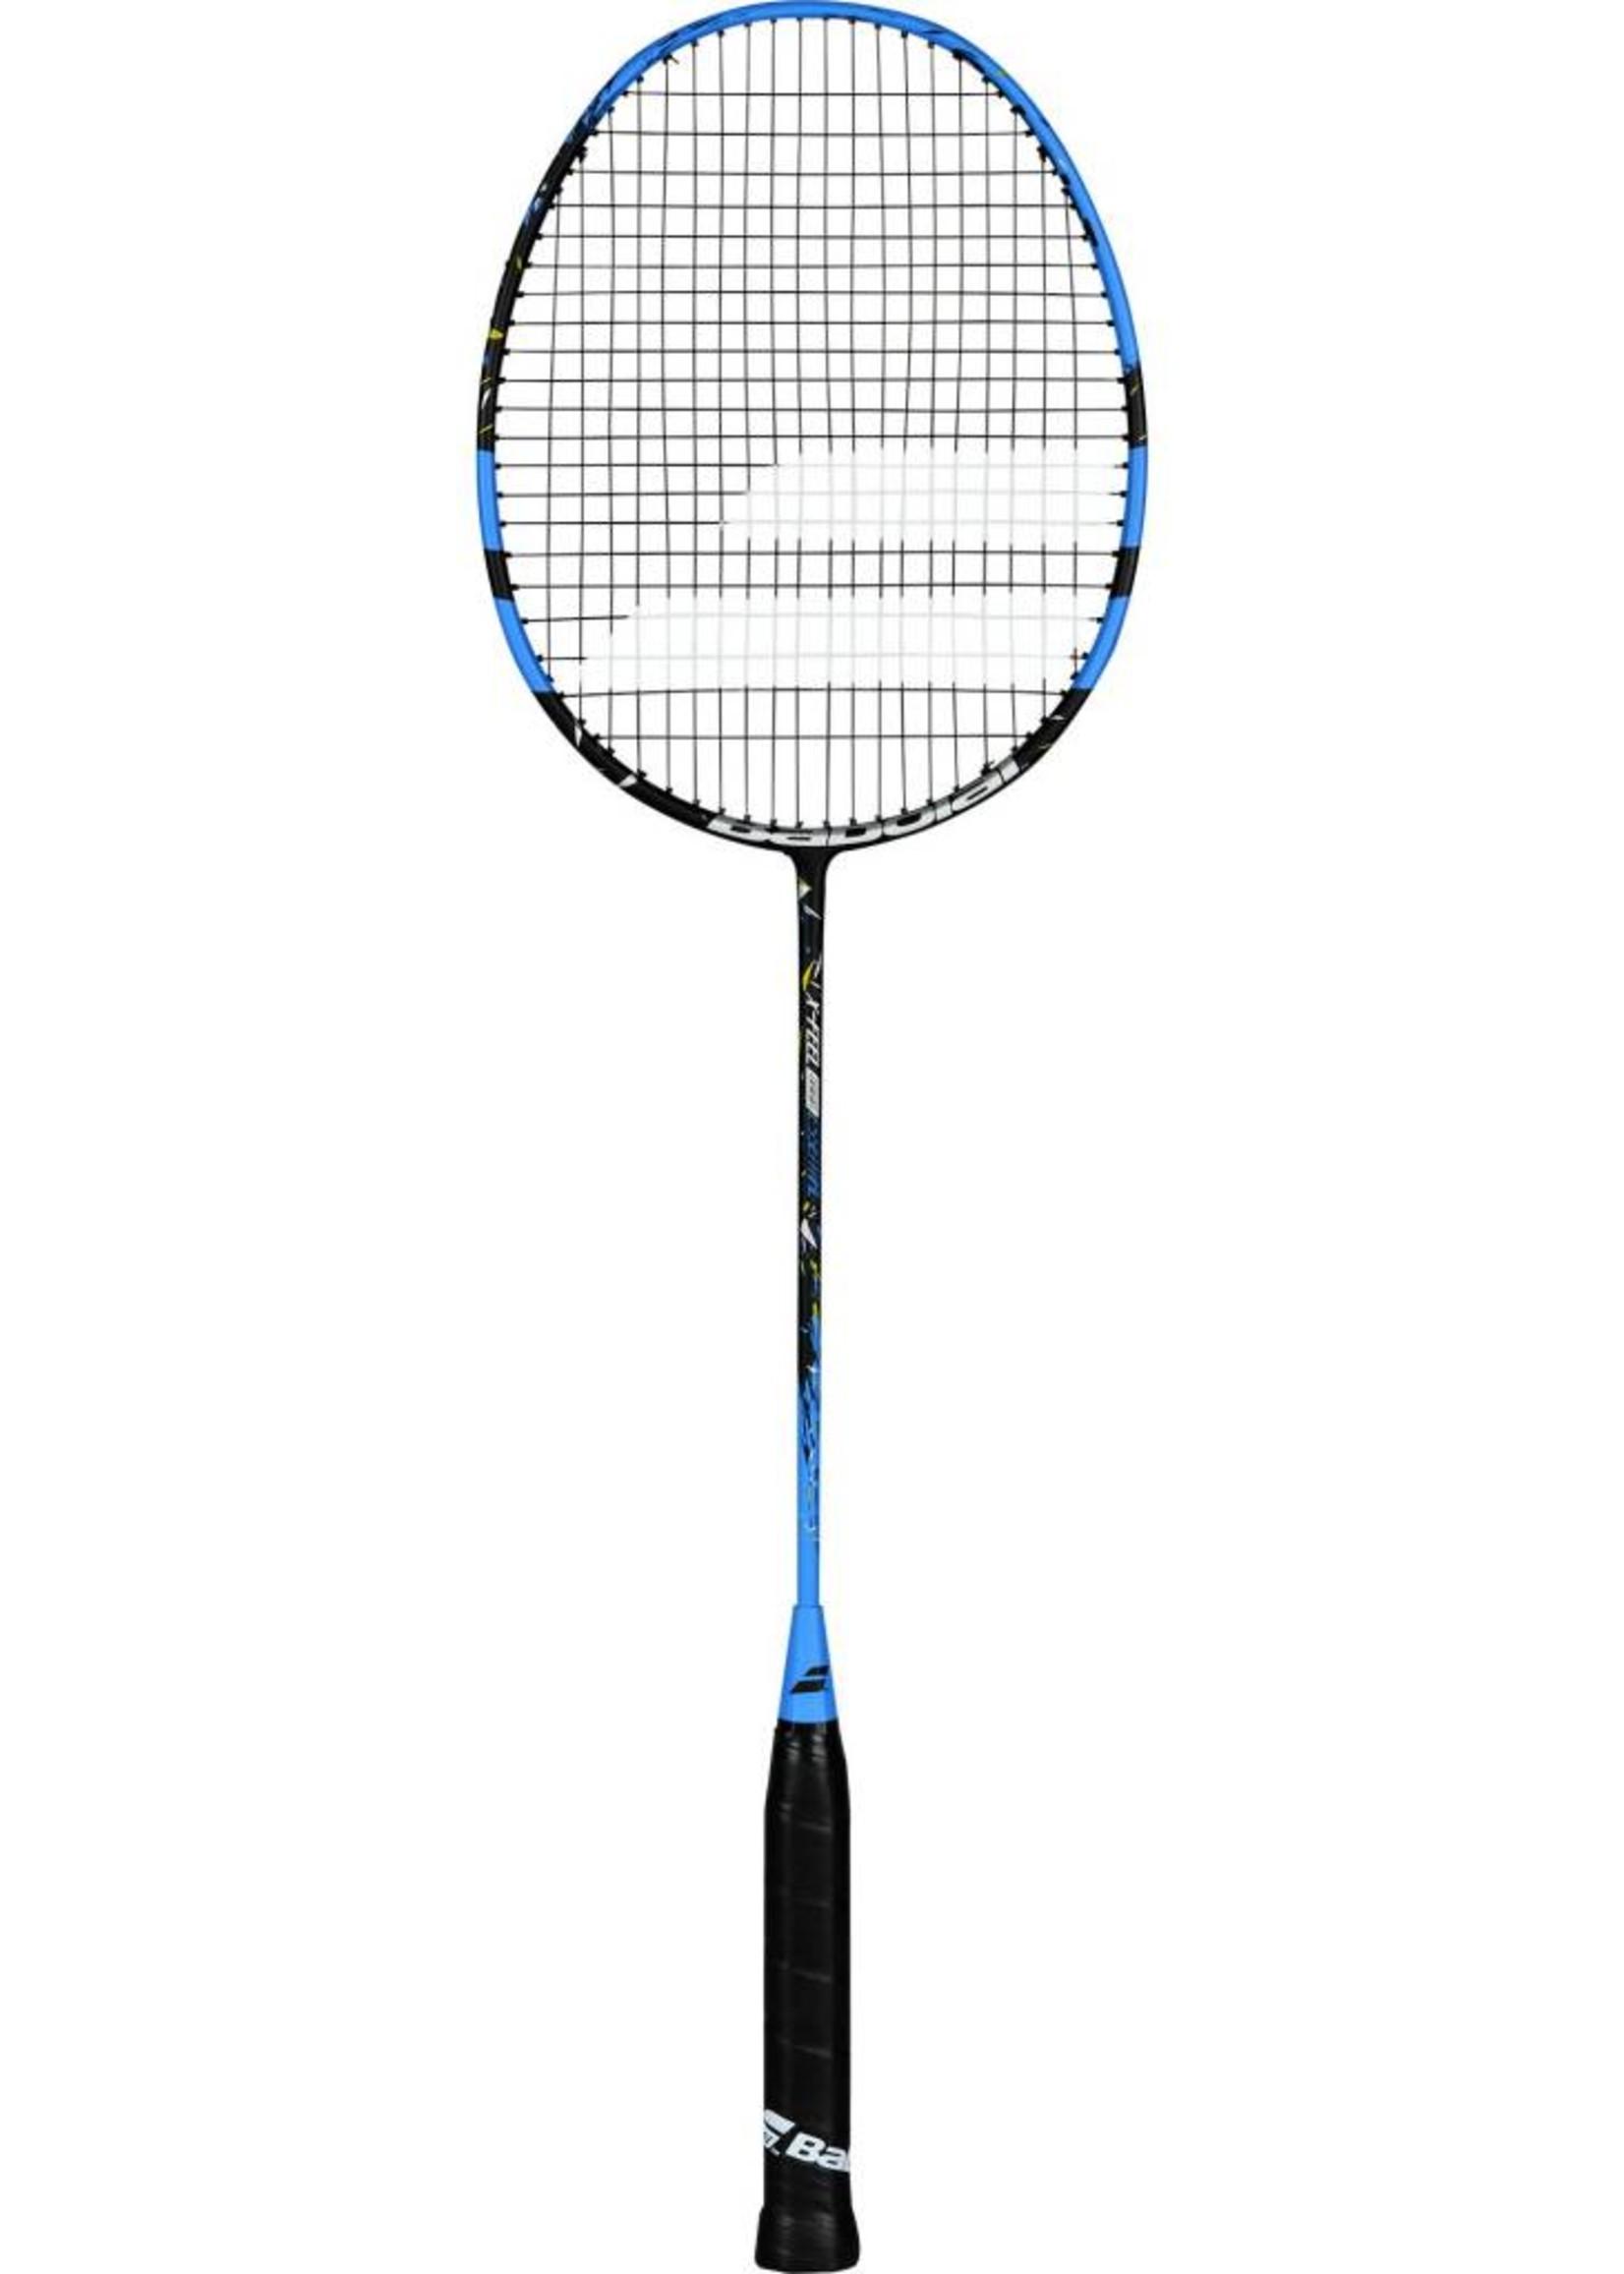 Babolat Babolat X-Feel Origin Essential Badminton Racket (2018)